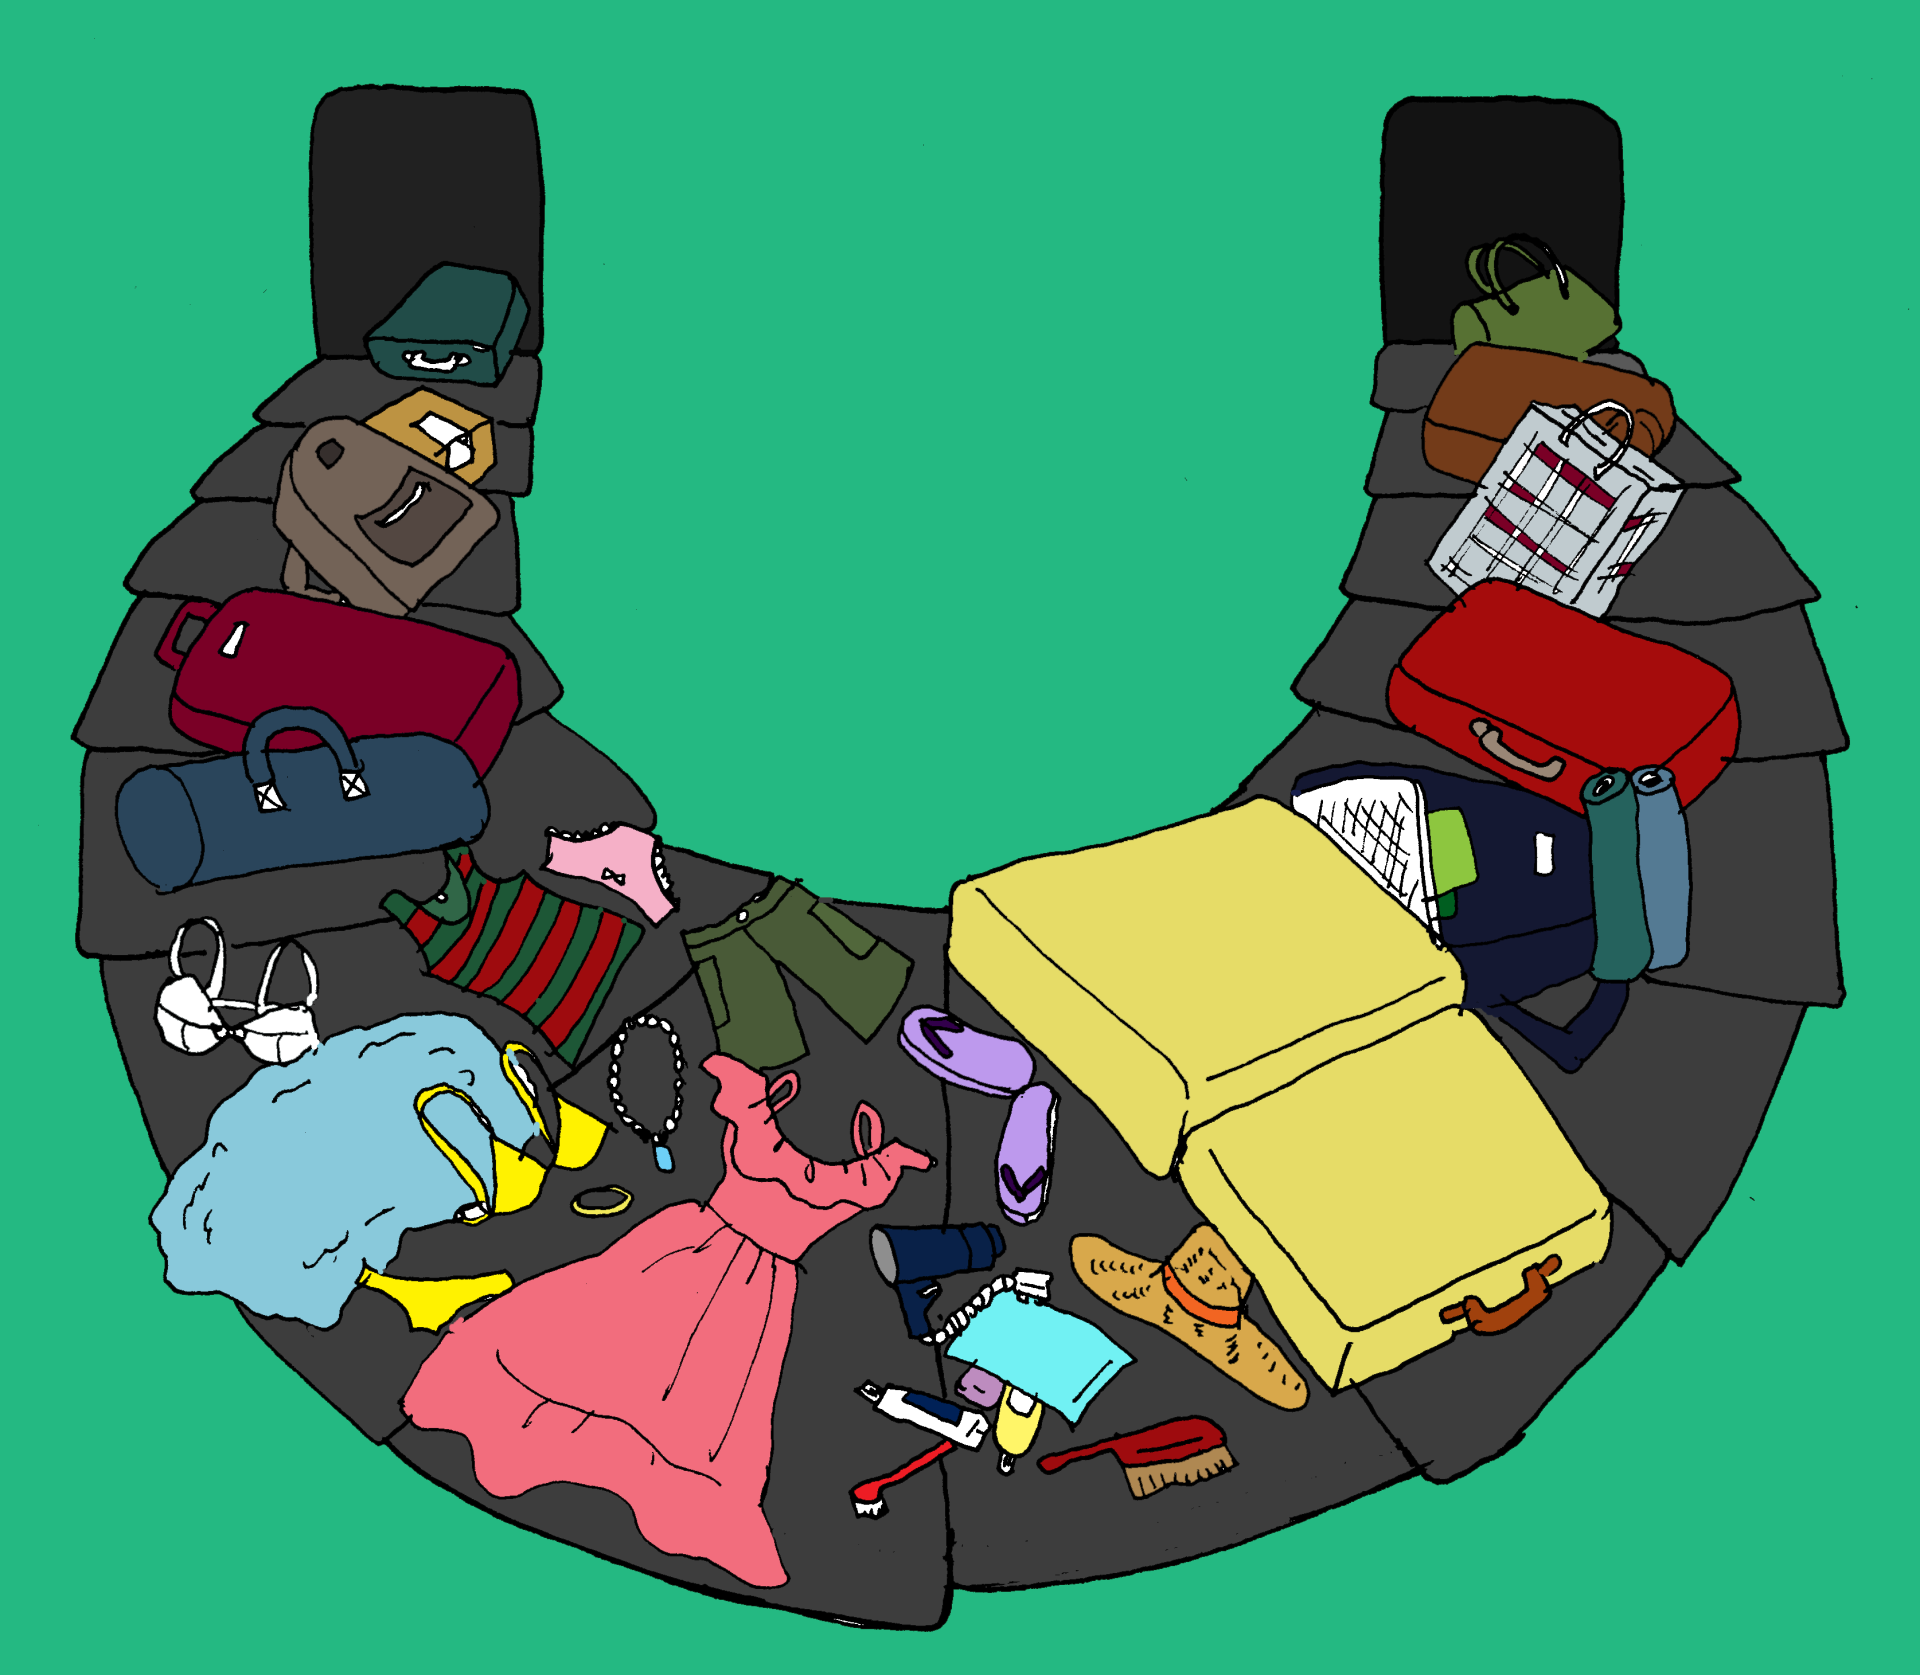 airport, baggage, baggage pick up, comic, nightmare, cartoon